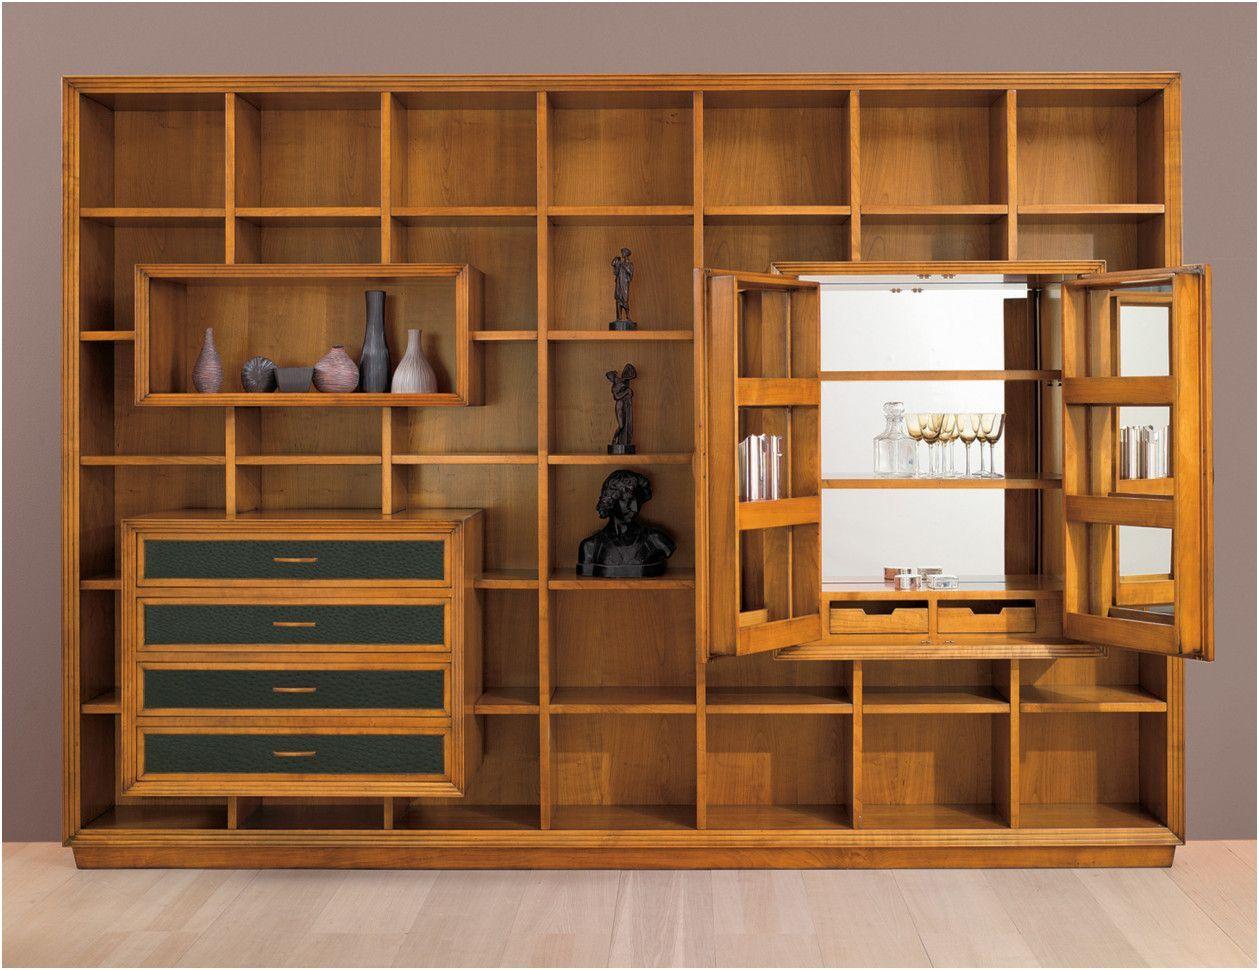 Idolza Bookshelf Wall Unit Creative Units Design Bookshelfdesign Bookcase Wall Unit Bookcase Wall Wall Bookshelves